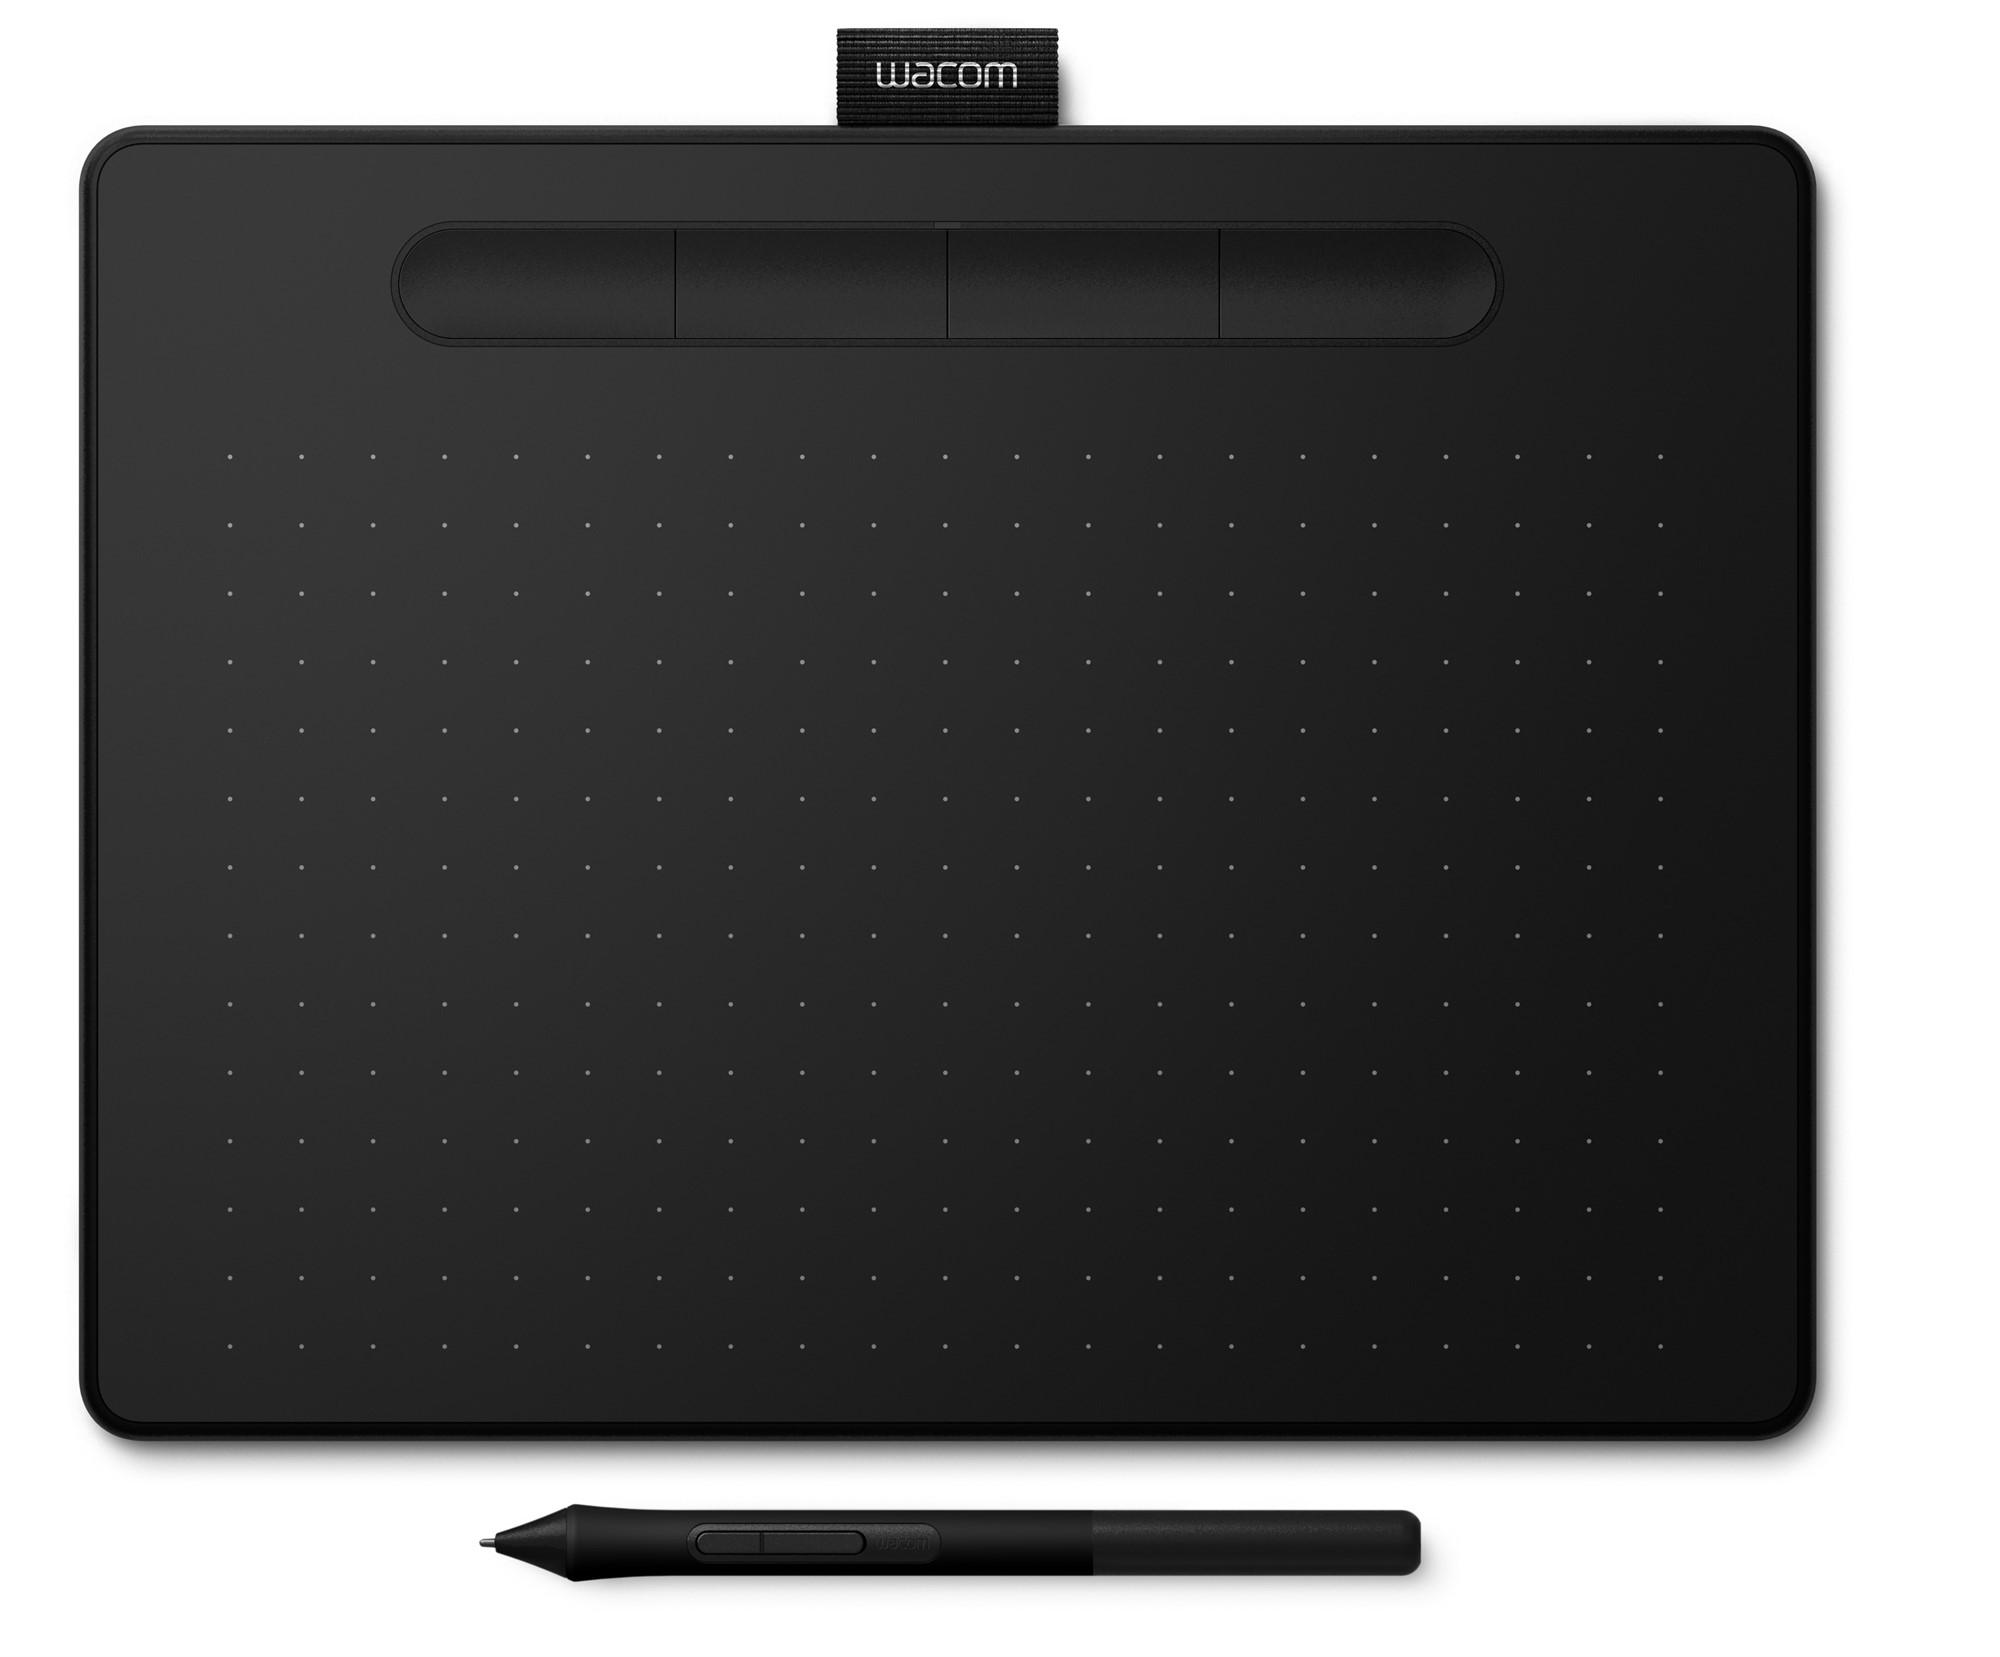 Wacom Intuos M Bluetooth 2540lpi 216 x 135mm USB/Bluetooth Black graphic tablet CTL-6100WLK-N